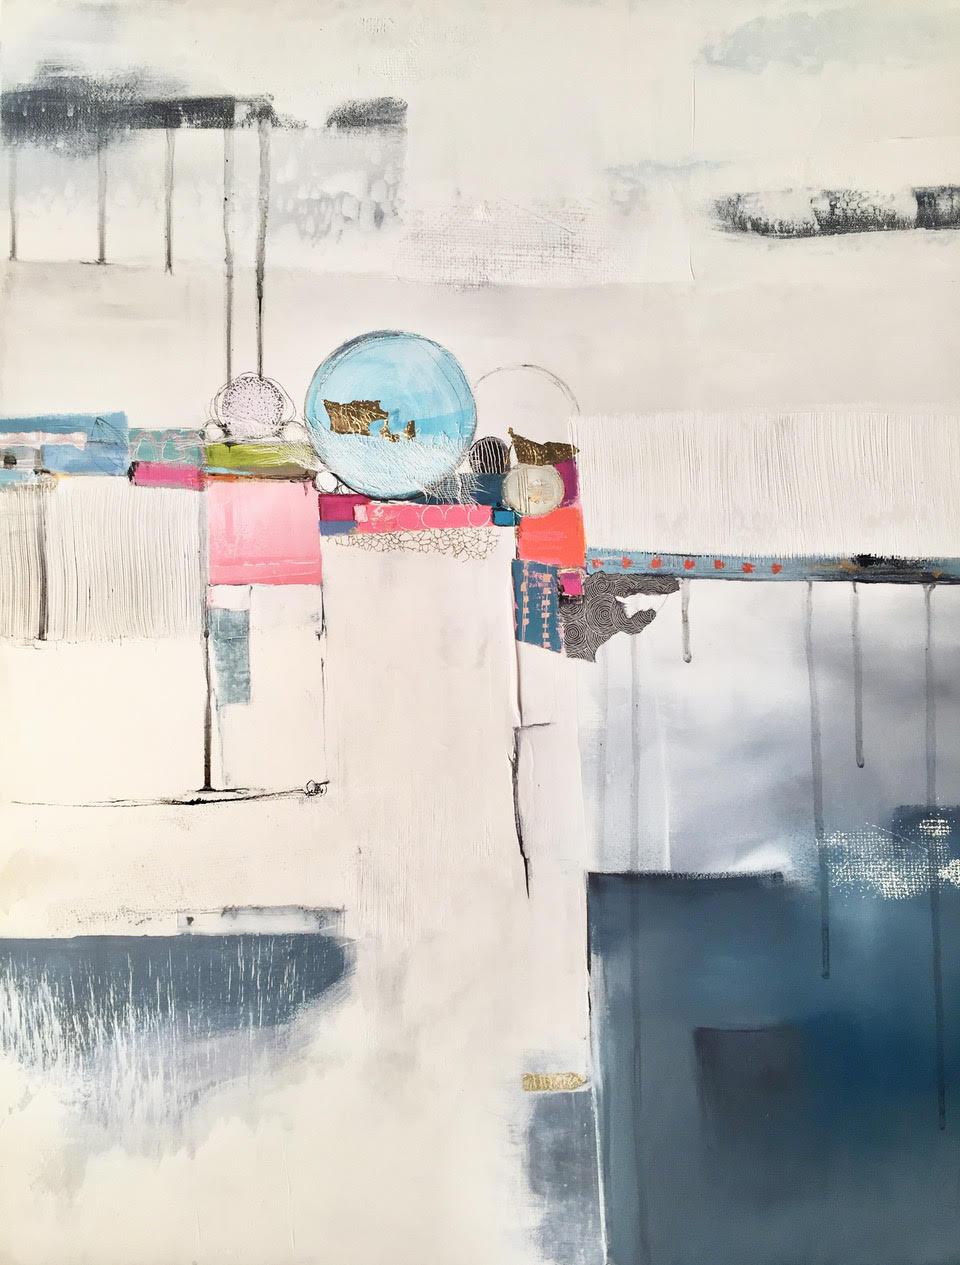 Lau Blou L'astre Don Carli Peinture abstraite